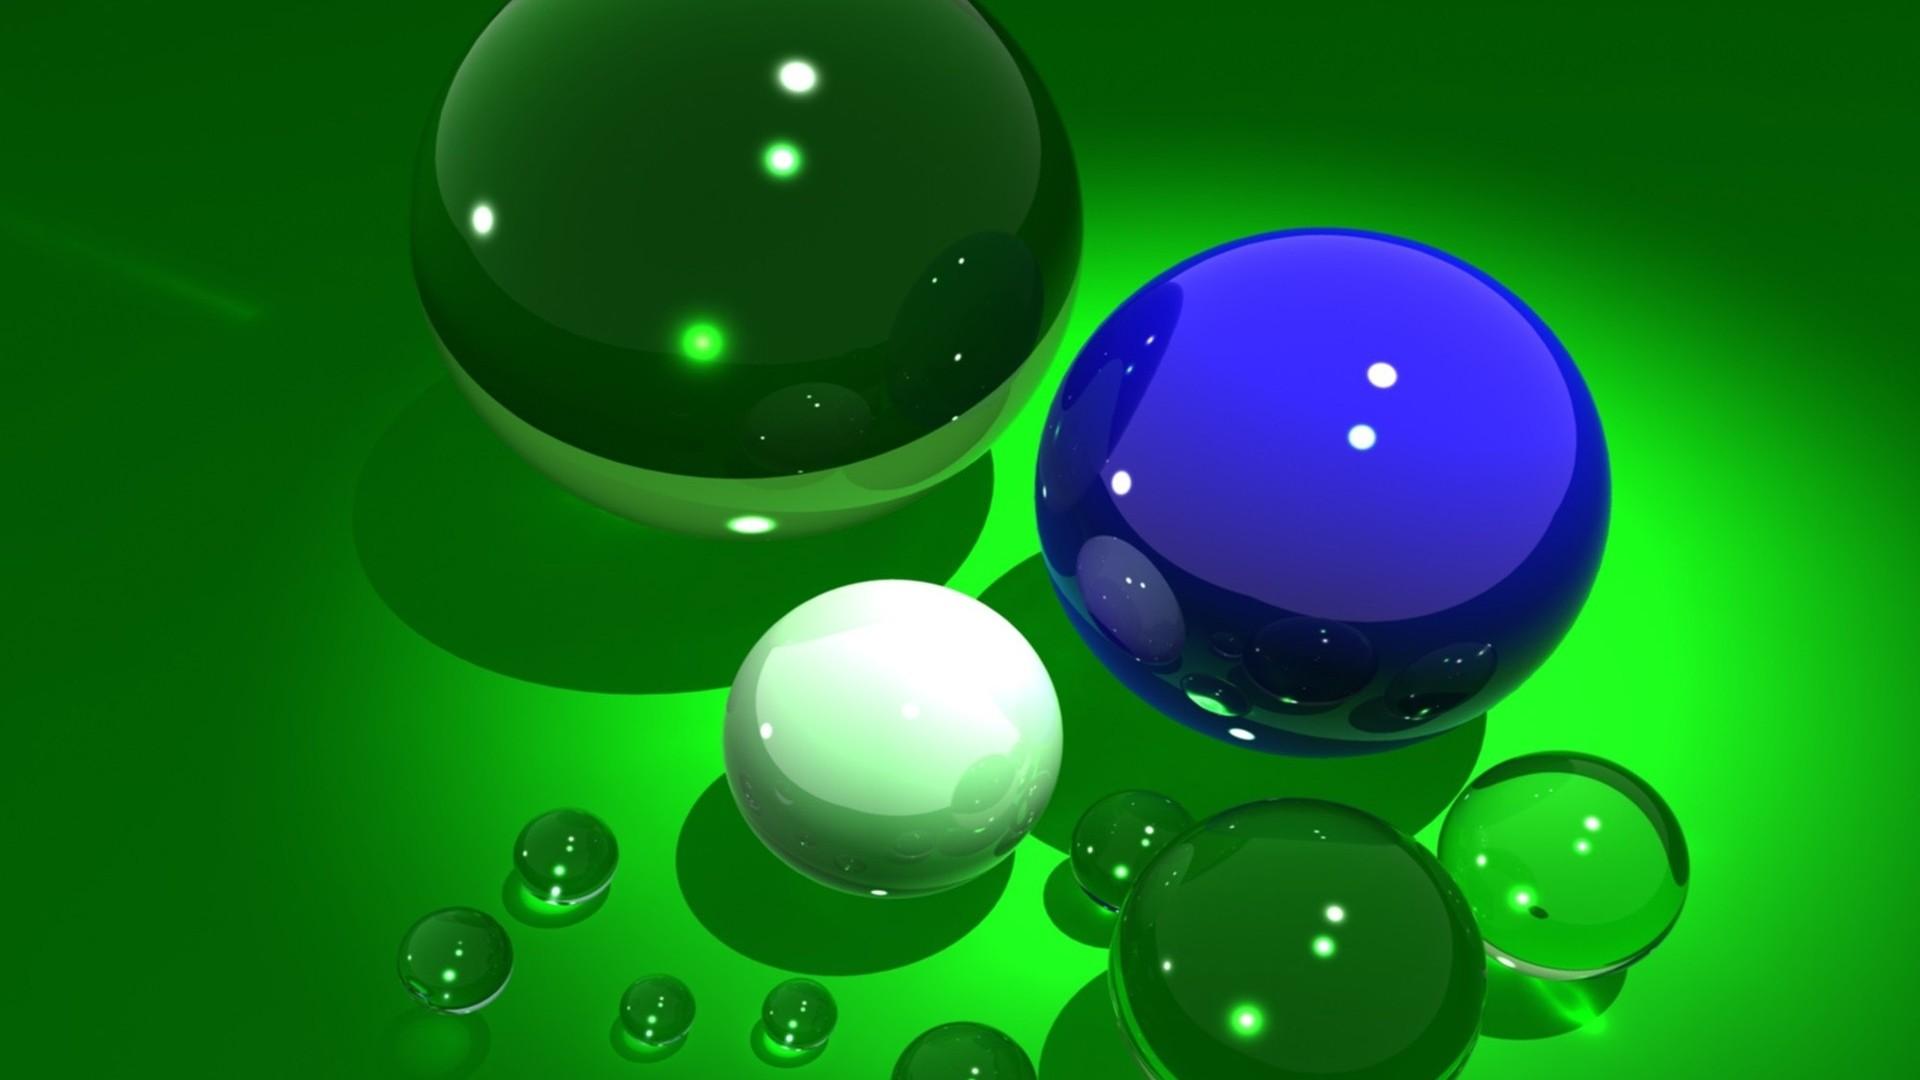 Glass 3d Hd Wallpapers 1080p Full Hd Wallpaper Glass 1920x1080 Wallpaper Teahub Io